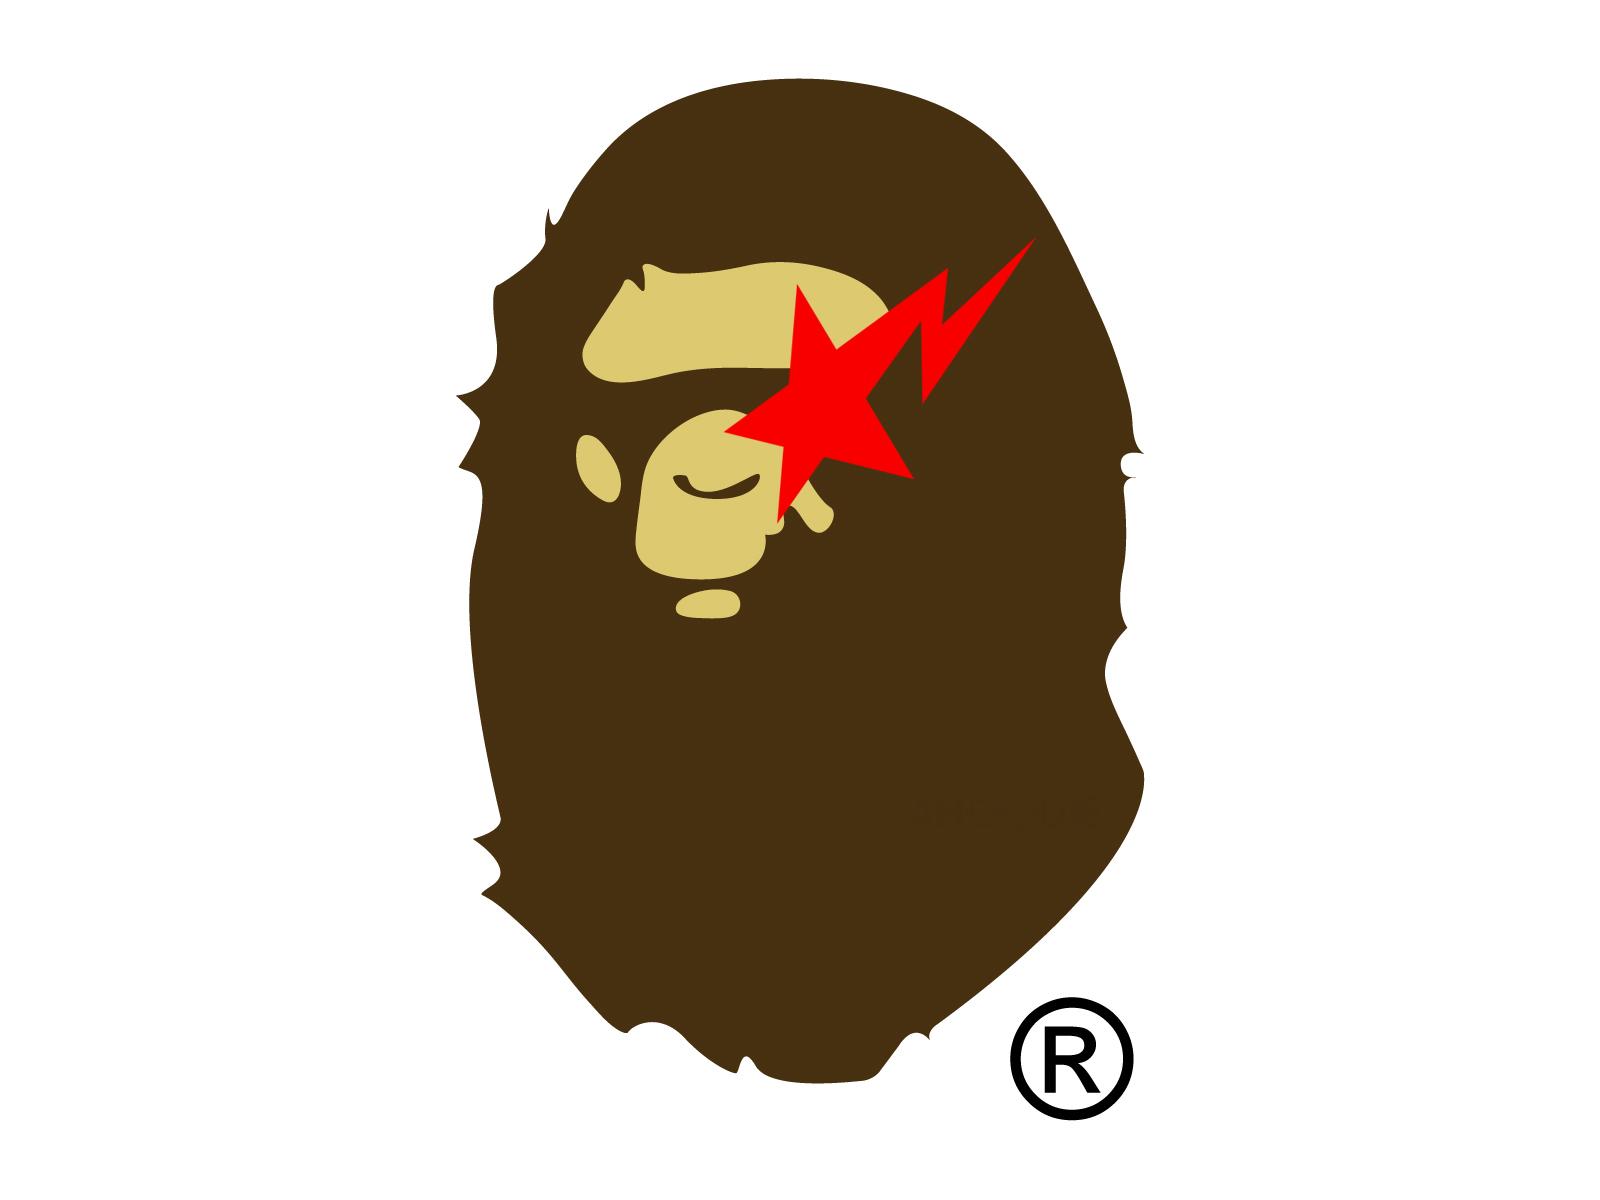 Bape Gorilla HD Wallpapers Bape Gorilla Desktop Wallpapers Bape 1600x1200